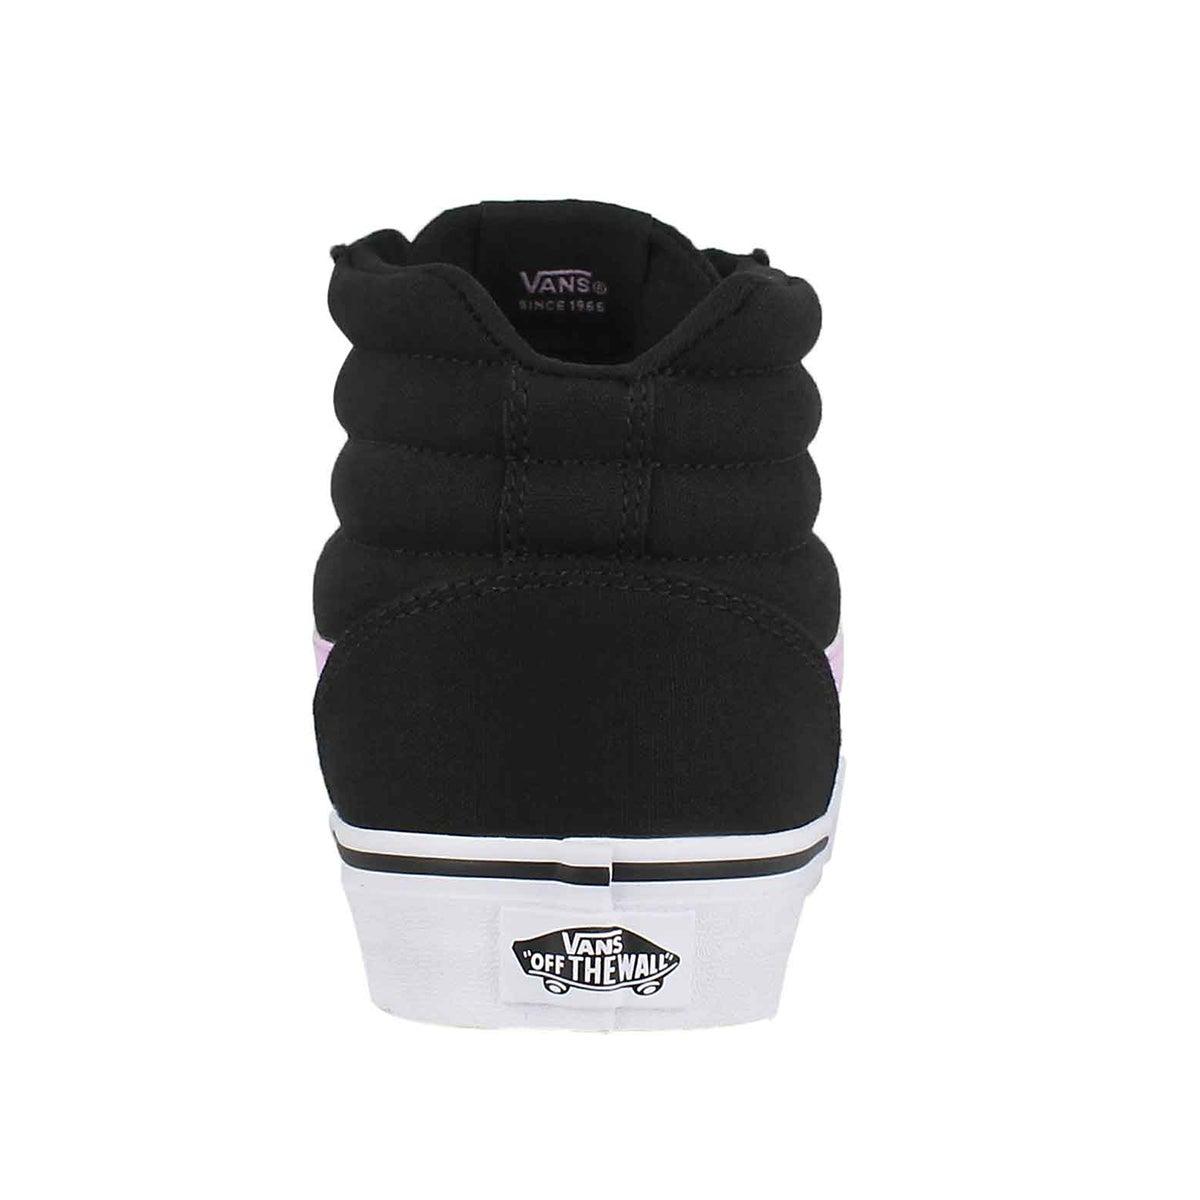 Vans-039-Women-039-s-Ward-Hi-Lace-Up-Sneaker